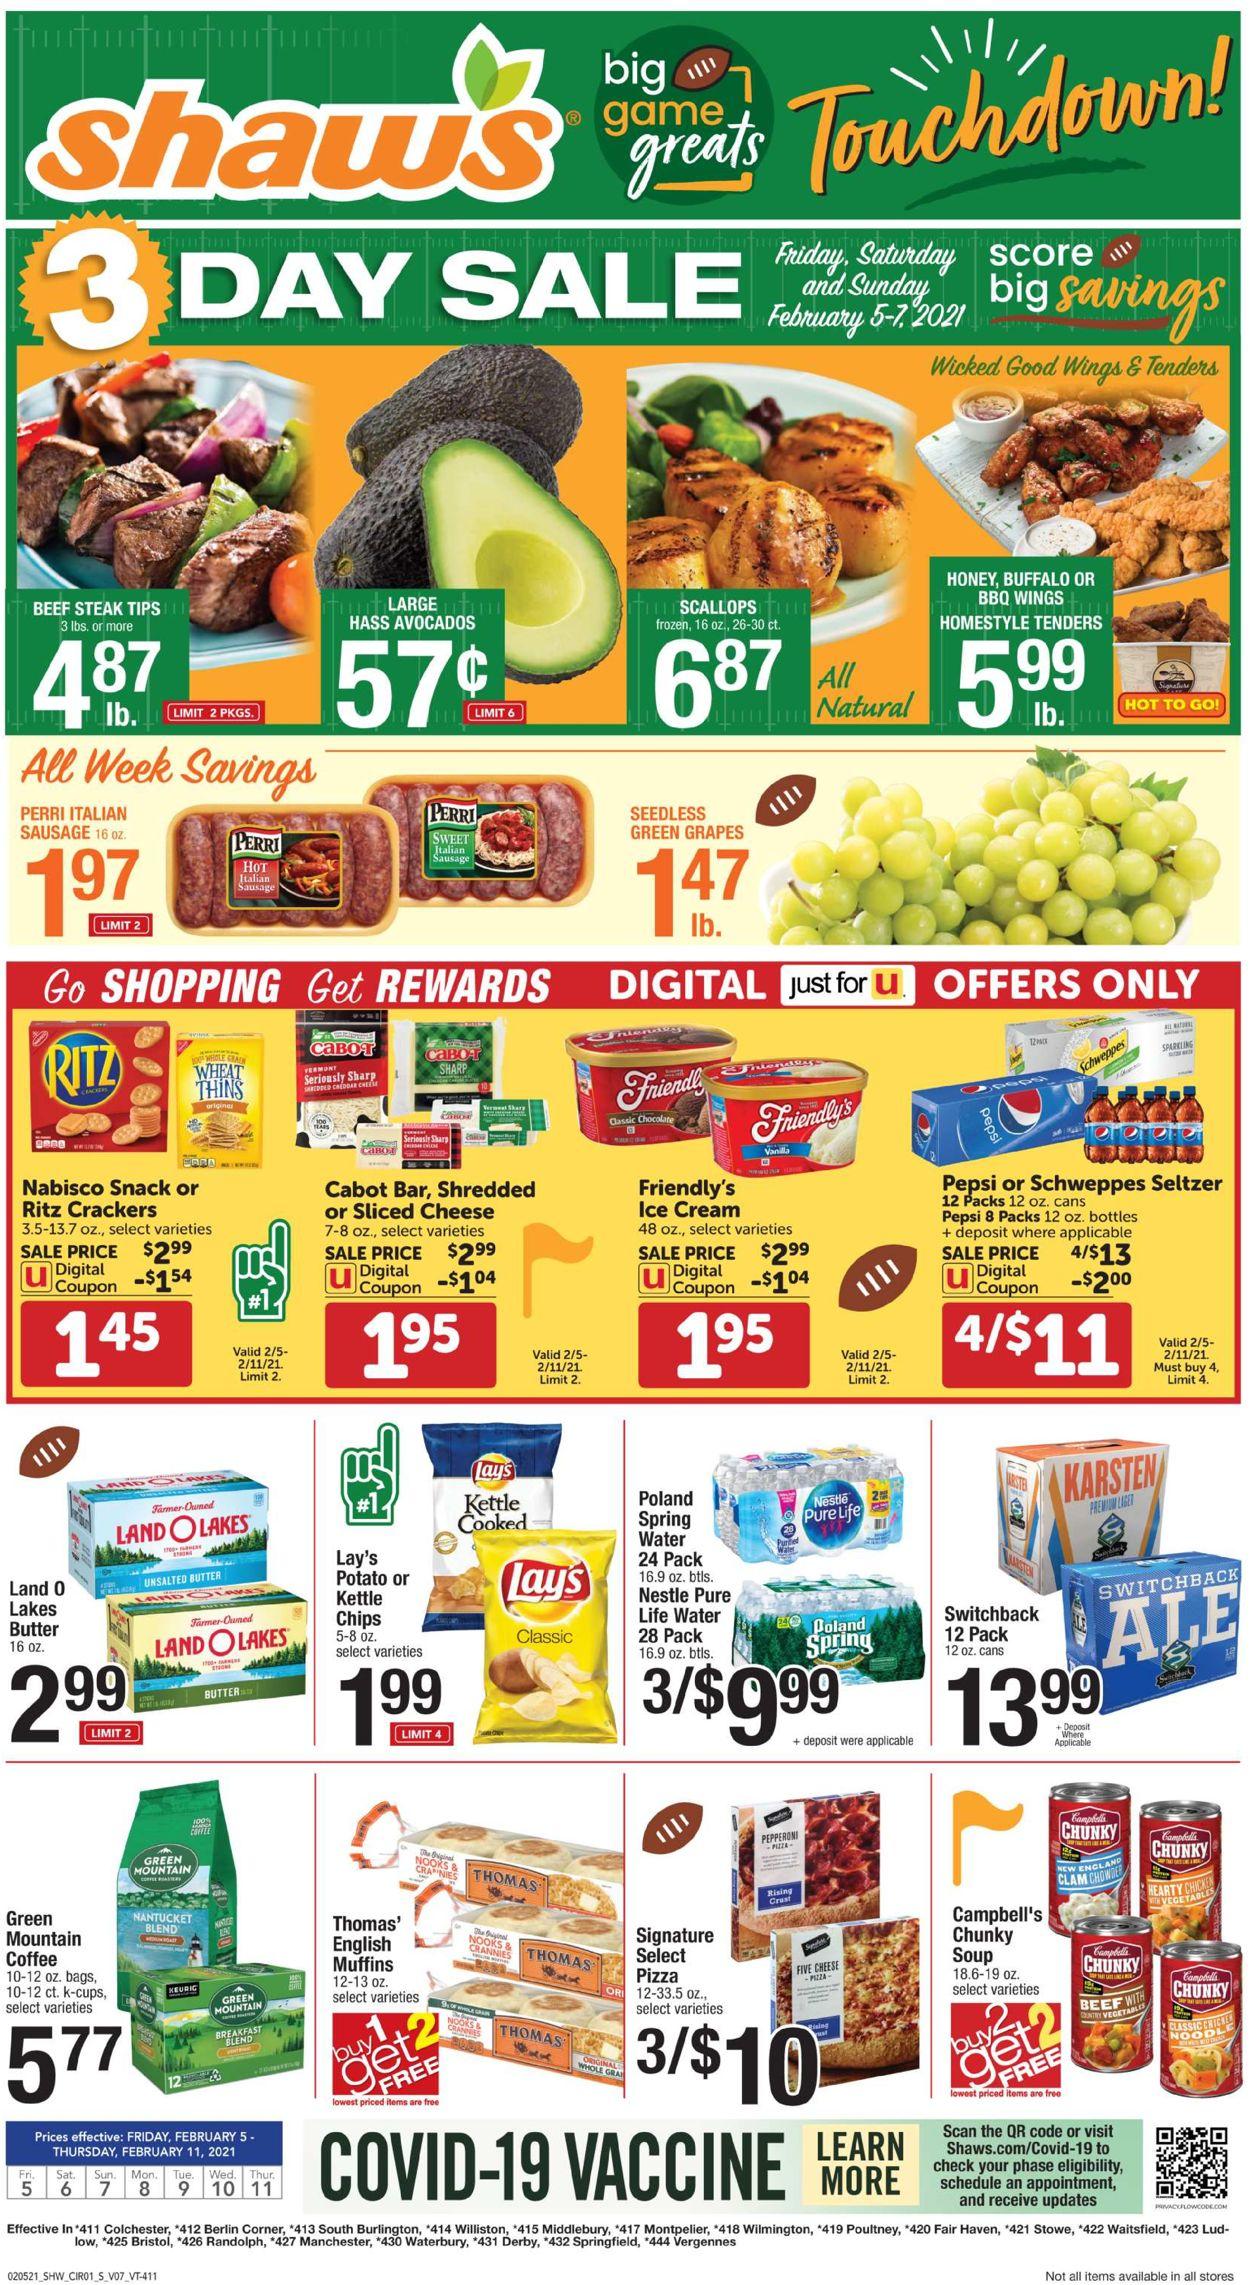 Shaw's Weekly Ad Circular - valid 02/05-02/11/2021